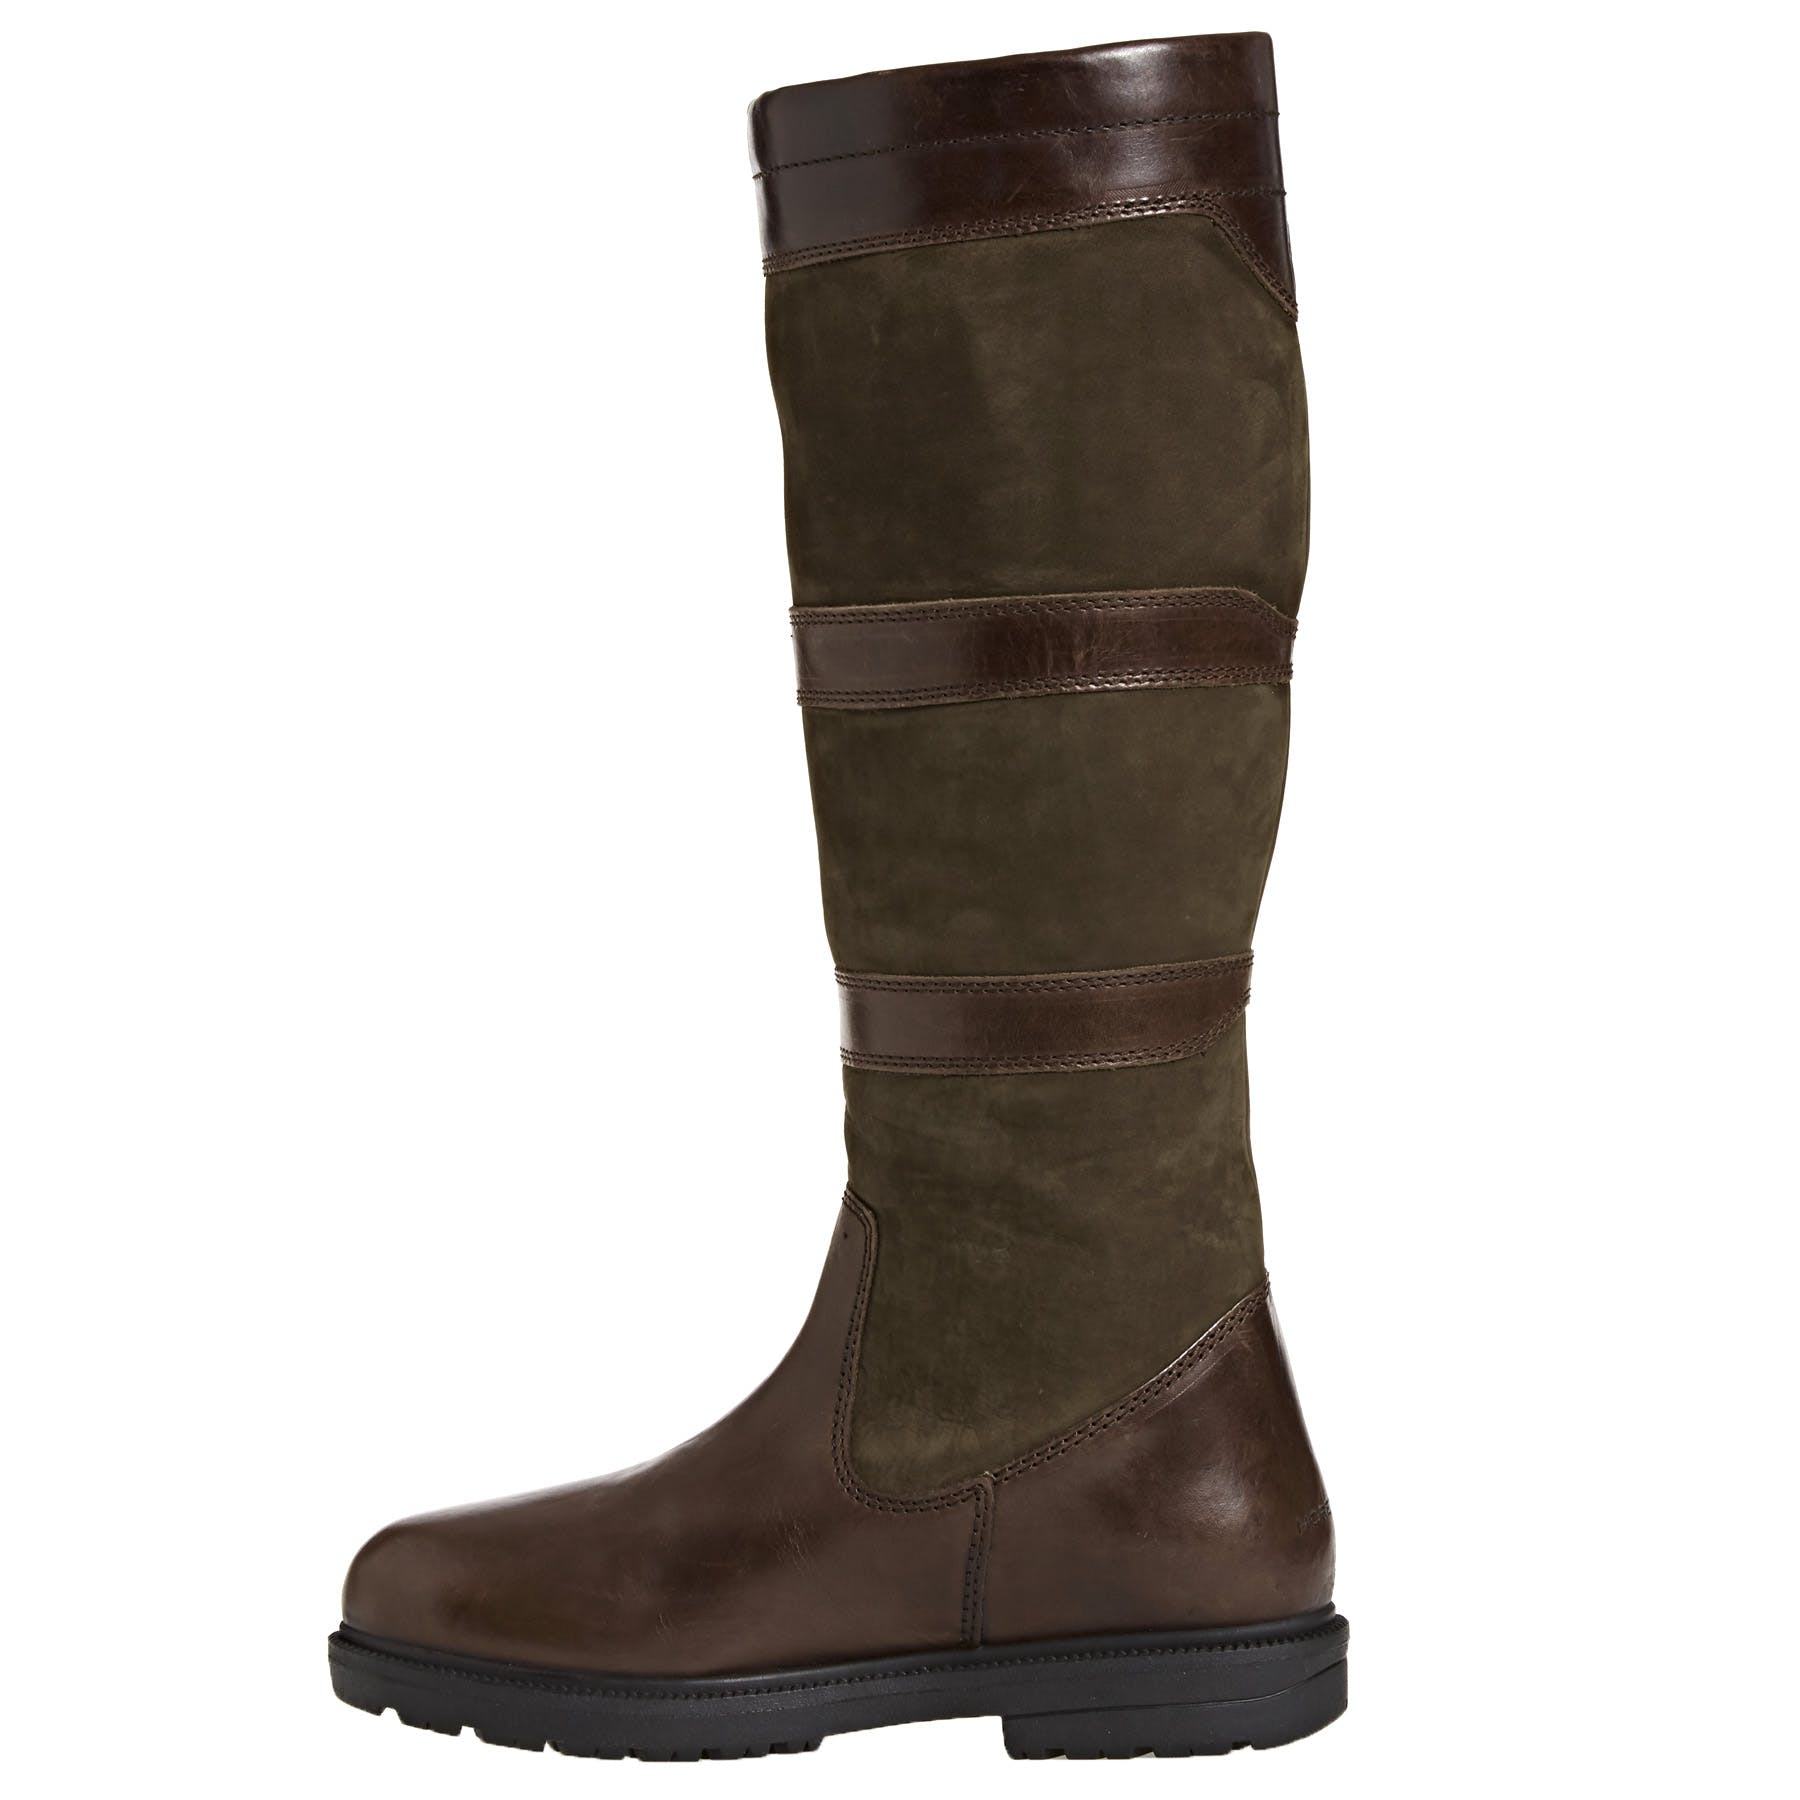 Shires Moretta Nella Long Boots Standard Calf